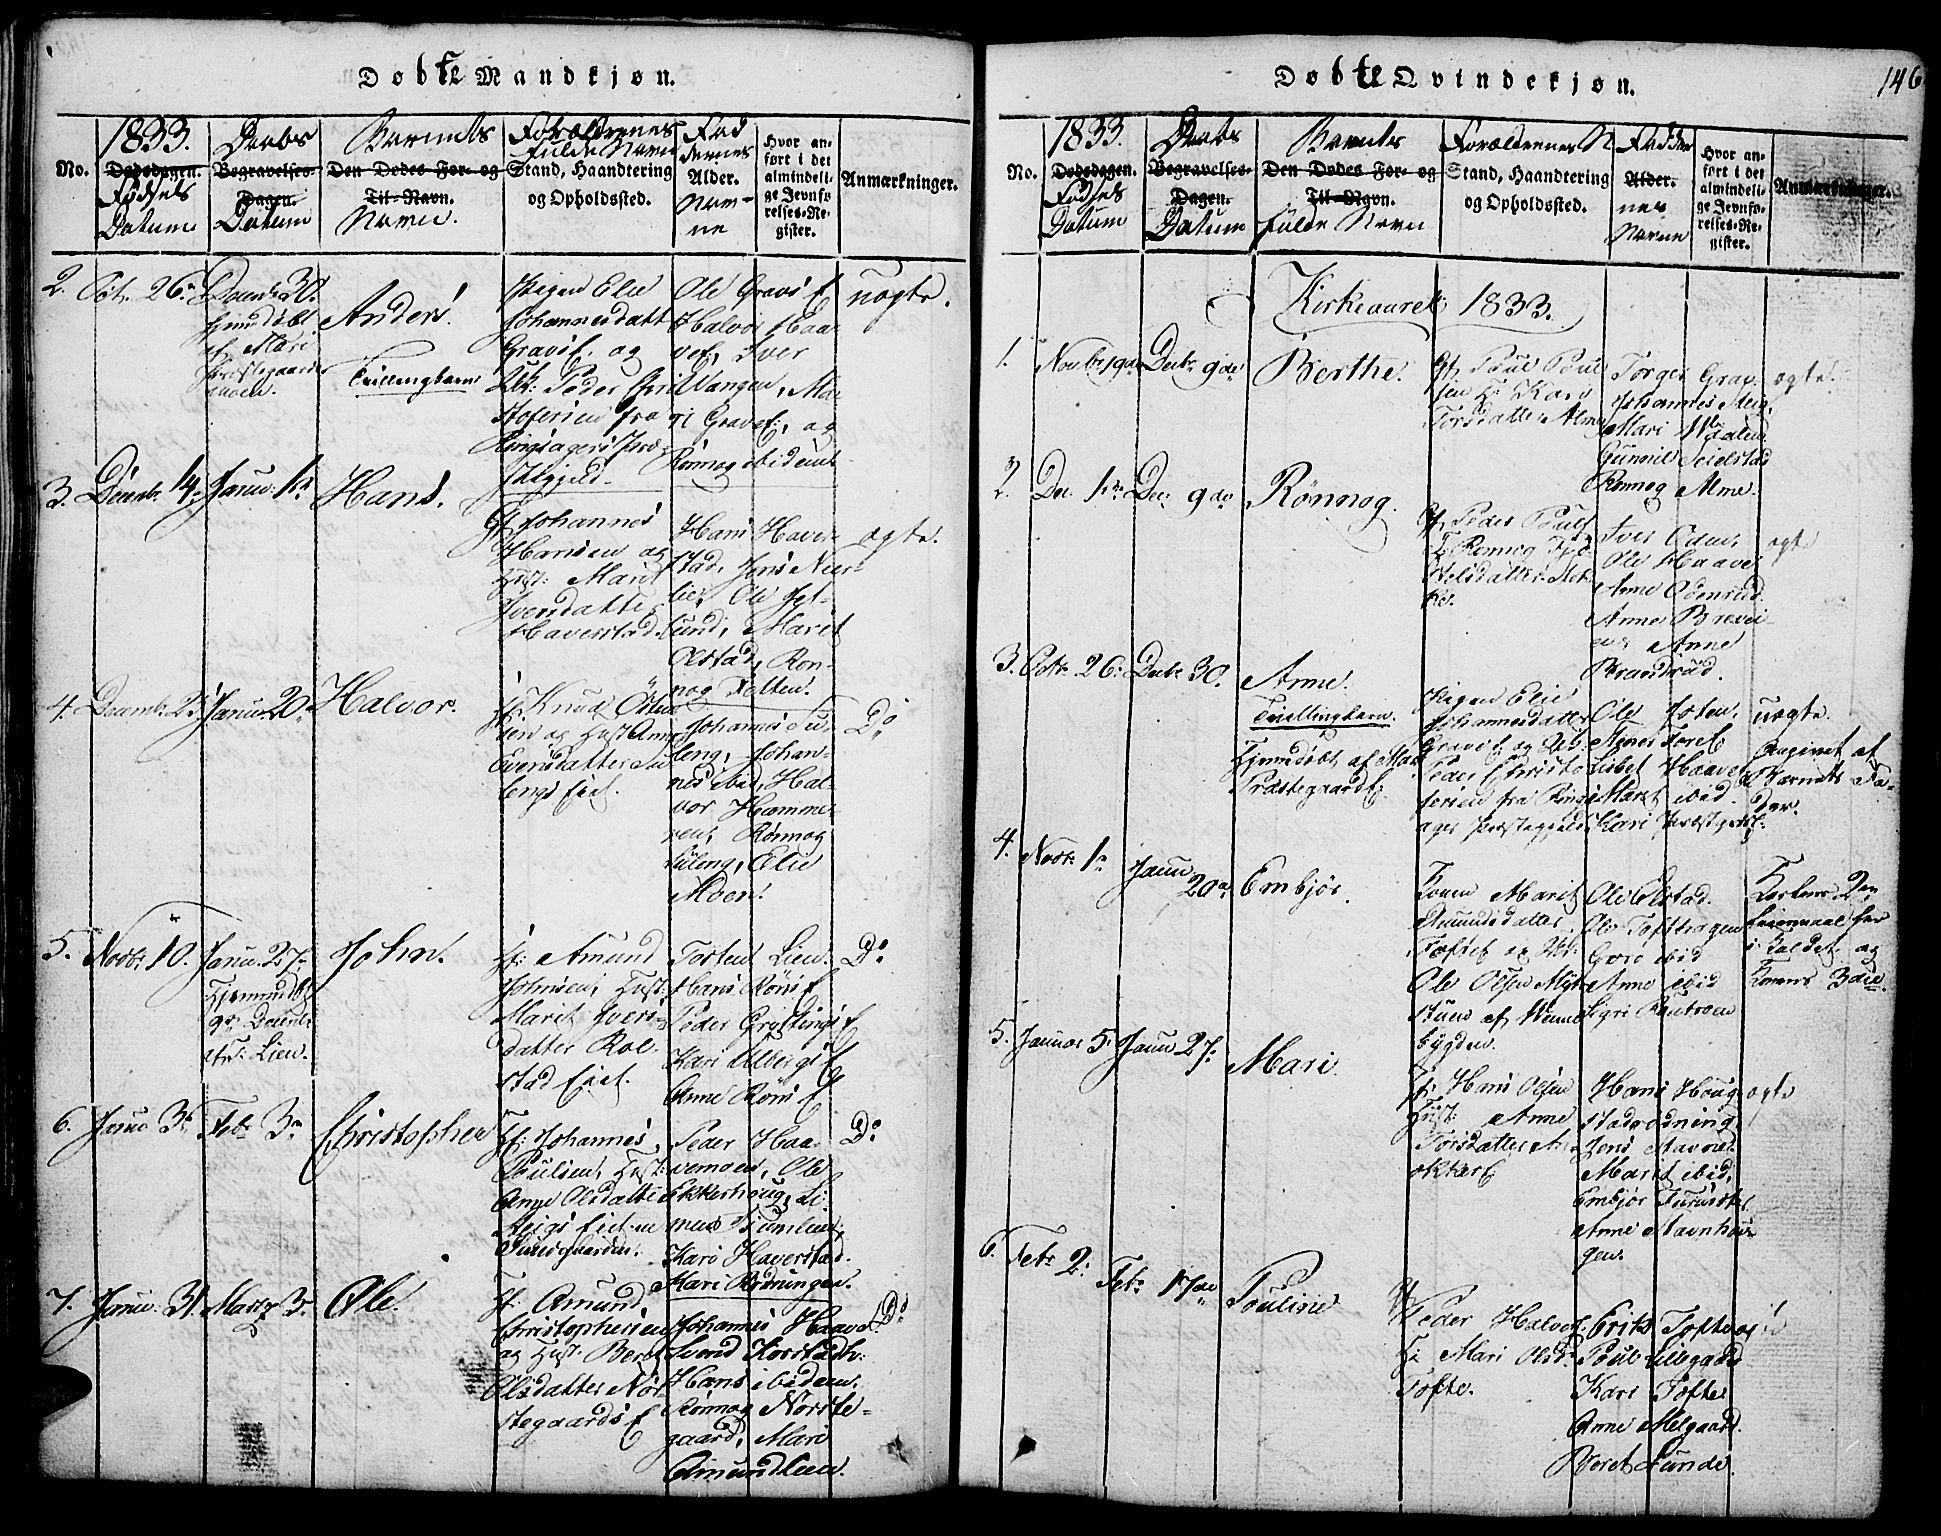 SAH, Fron prestekontor, H/Ha/Hab/L0001: Klokkerbok nr. 1, 1816-1843, s. 146